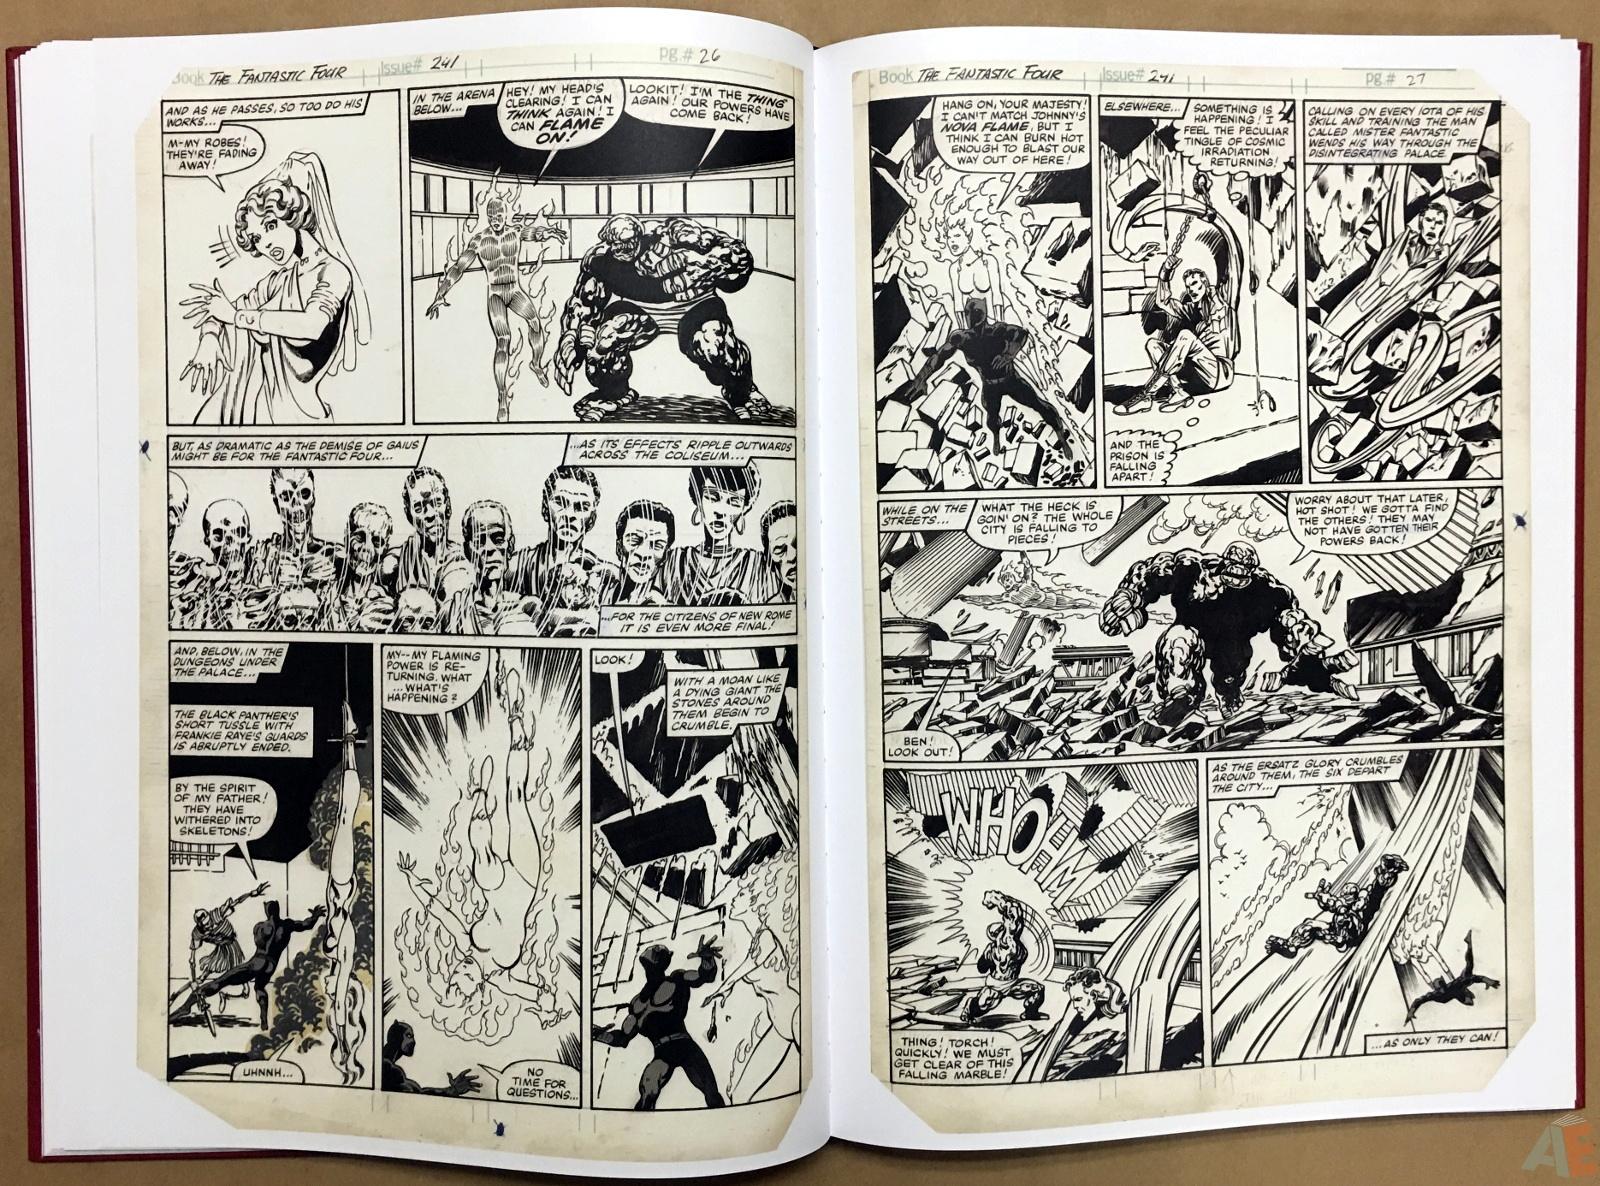 John Byrne's The Fantastic Four Artist's Edition 22